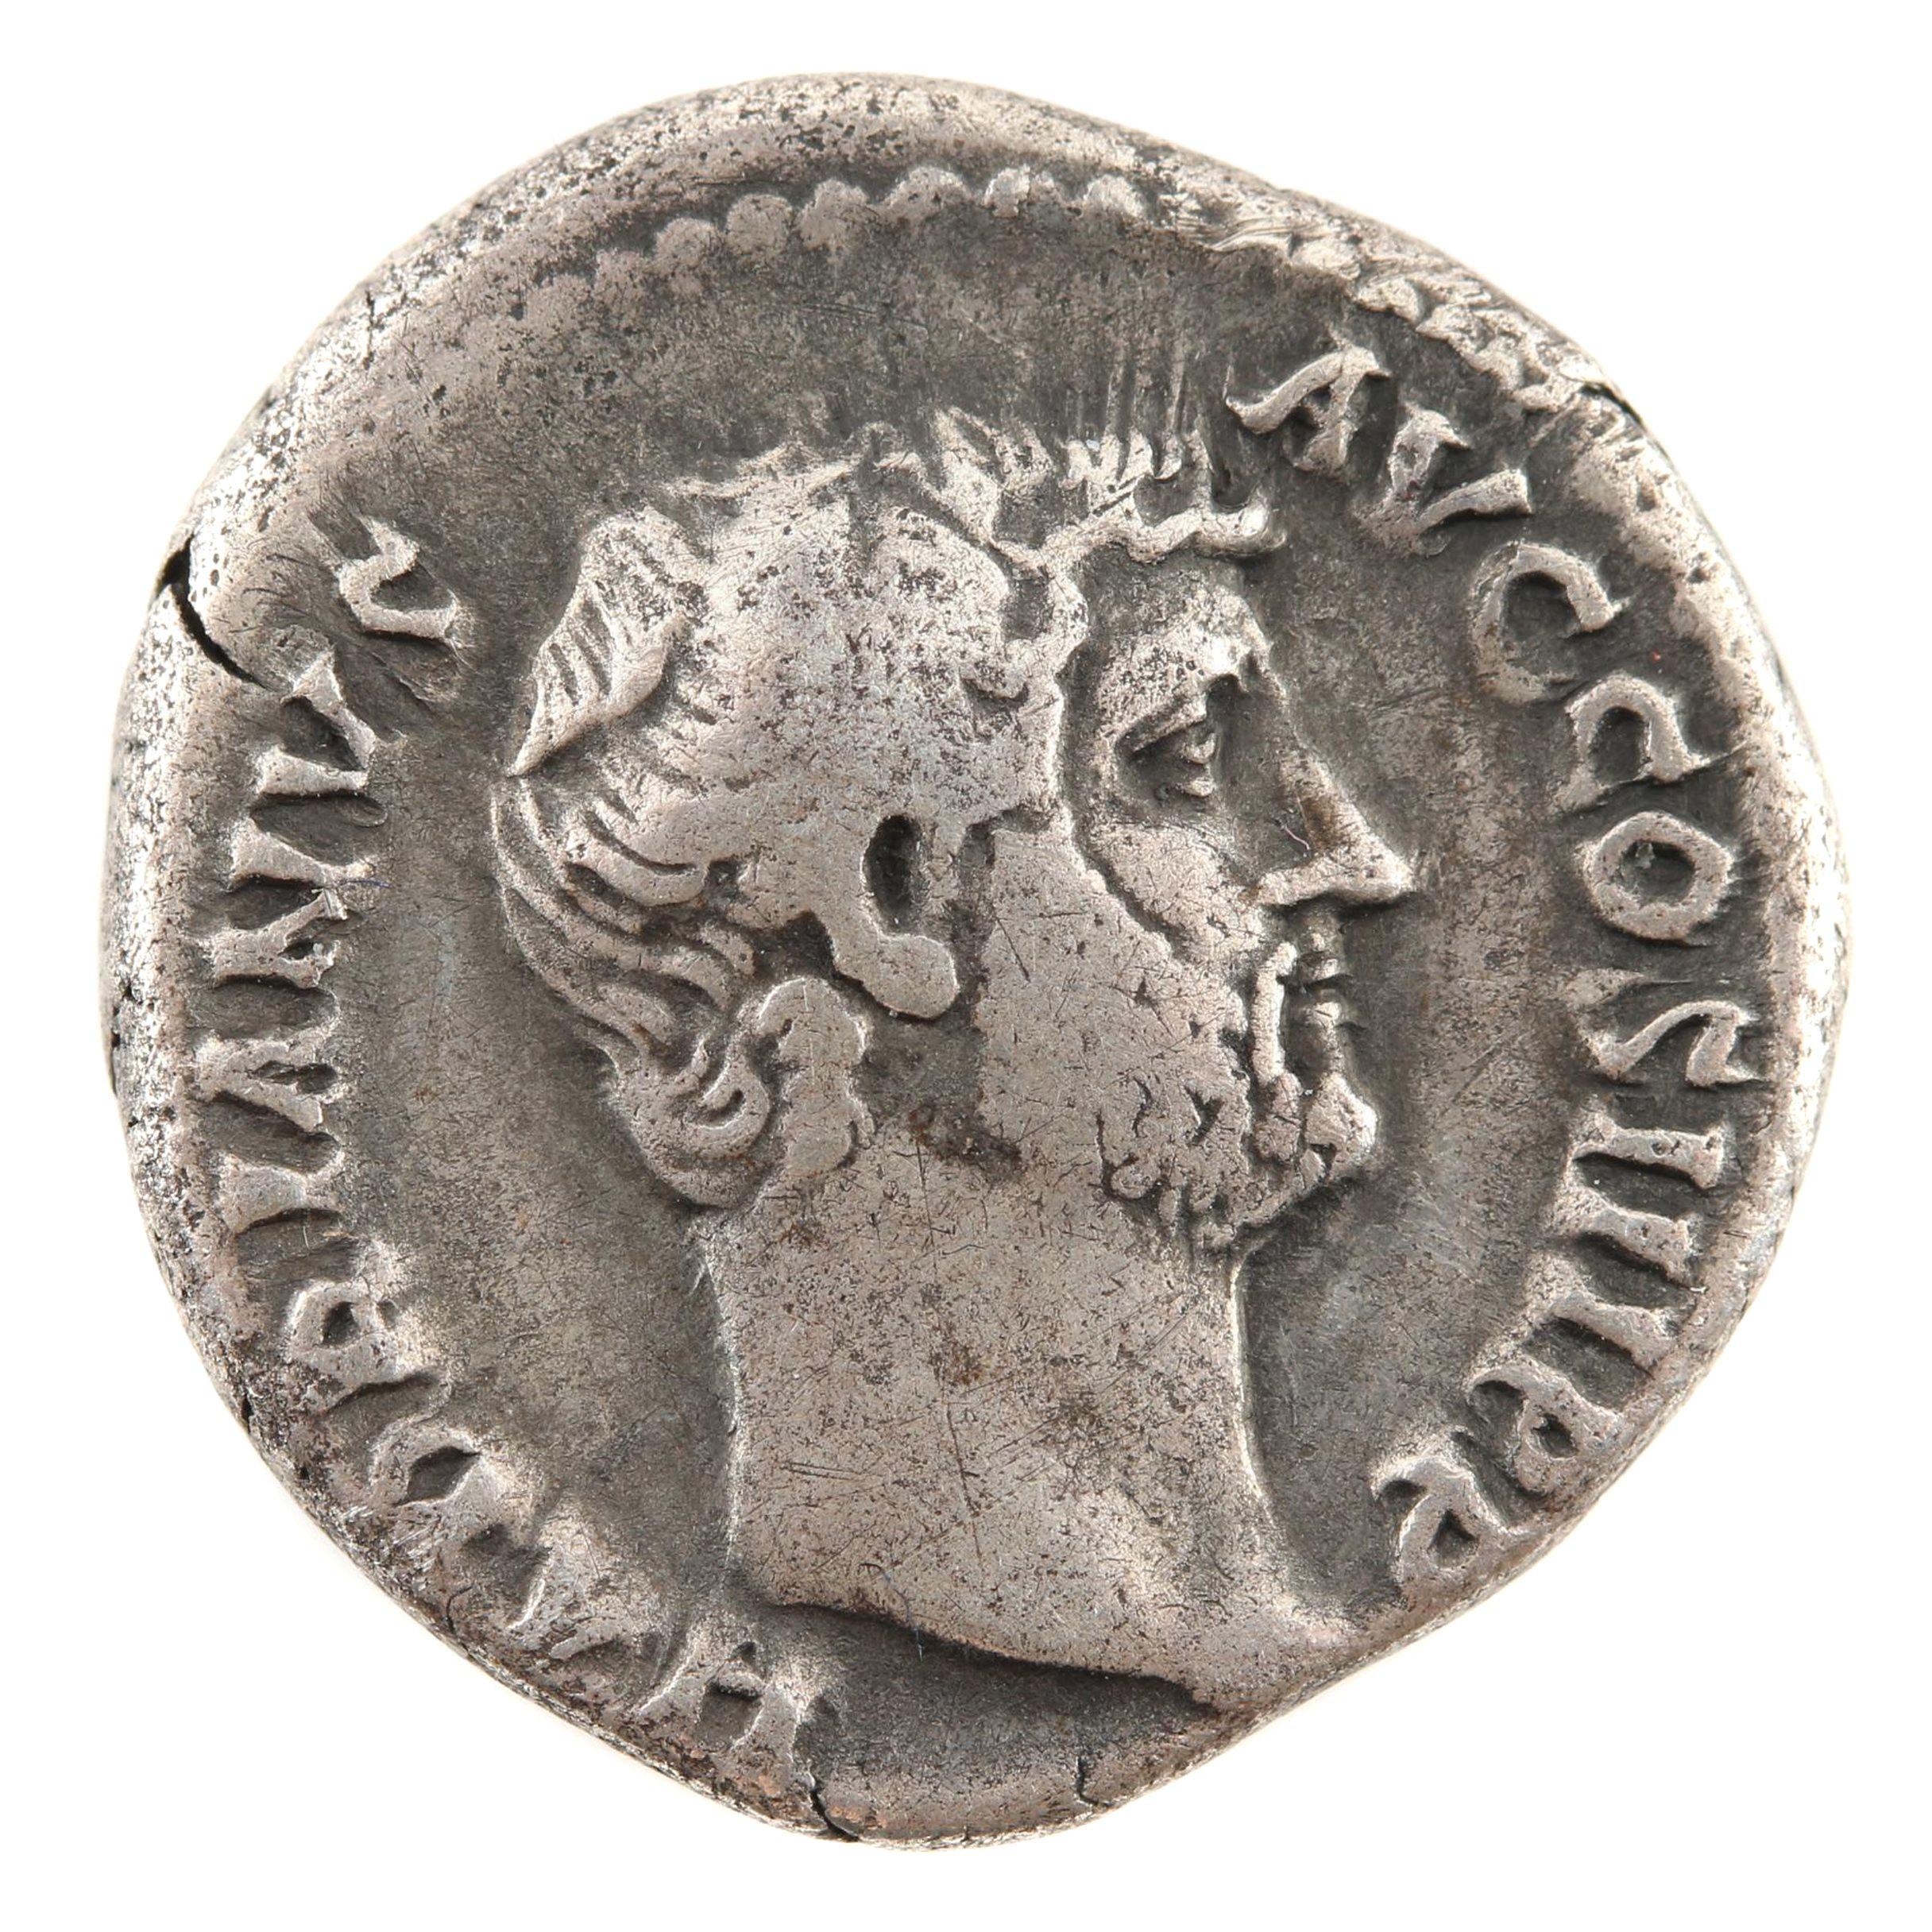 Ancient Roman Silver Denarius Coin Hadrian 117-138 A.D.